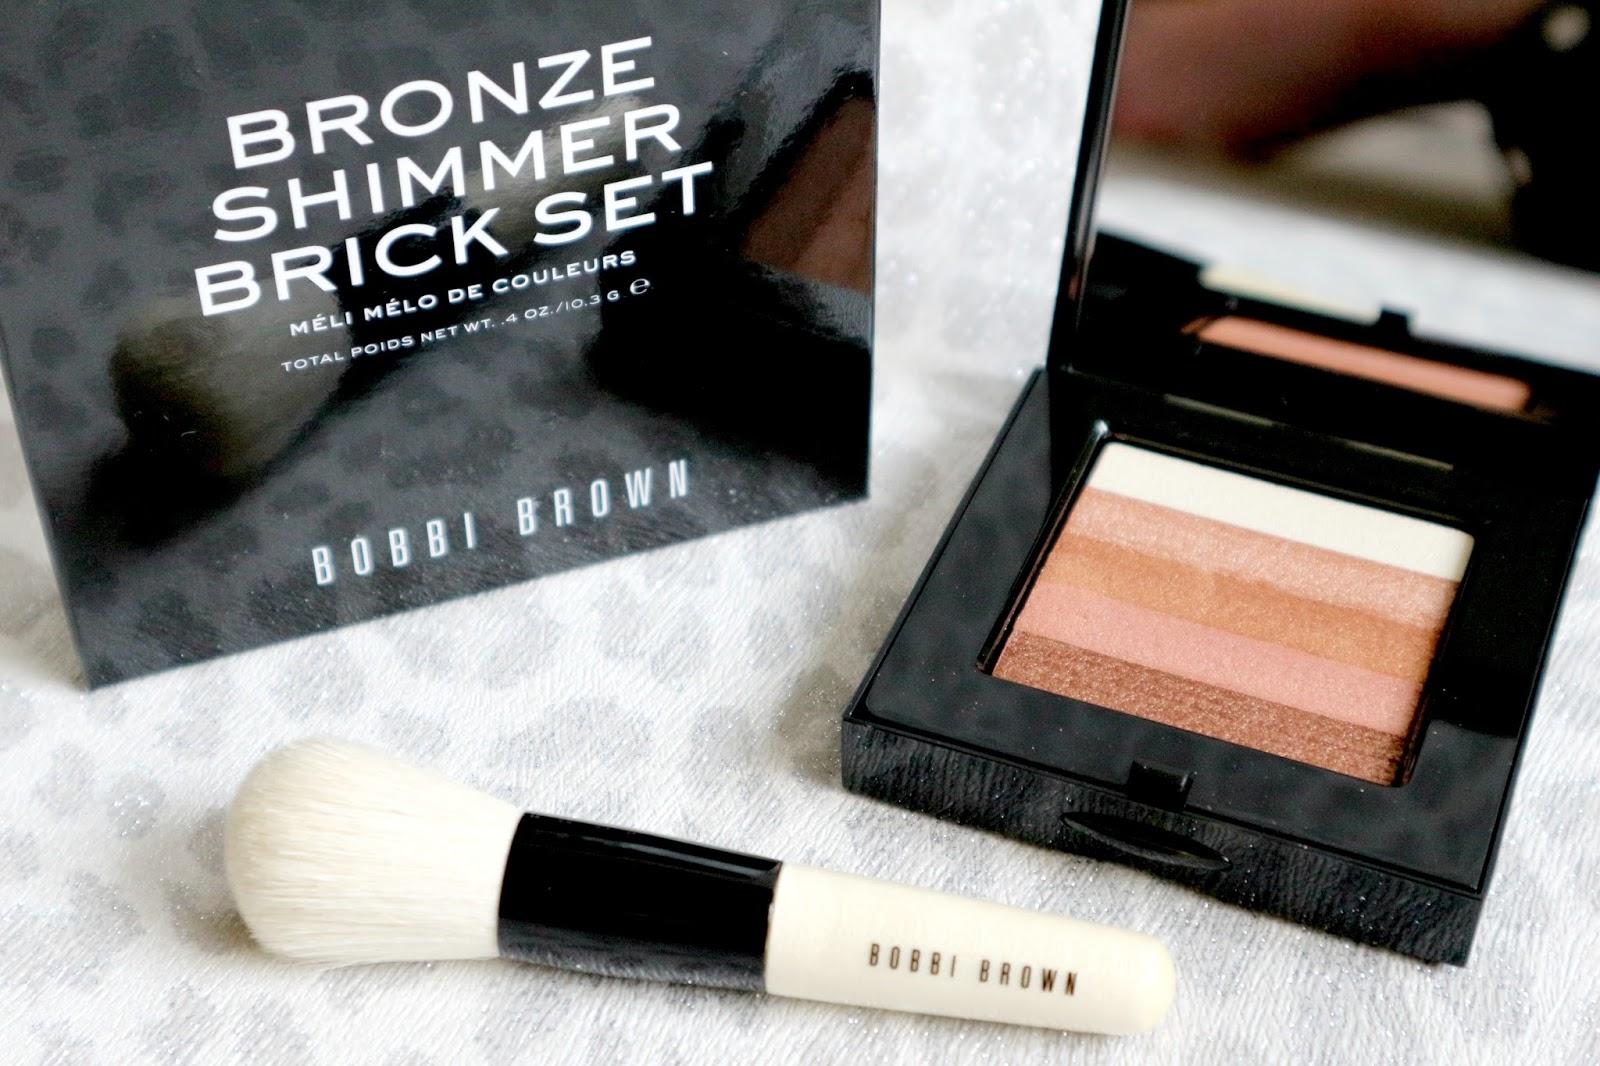 Bobbi Brown Shimmer Brick Set Bronze Brush